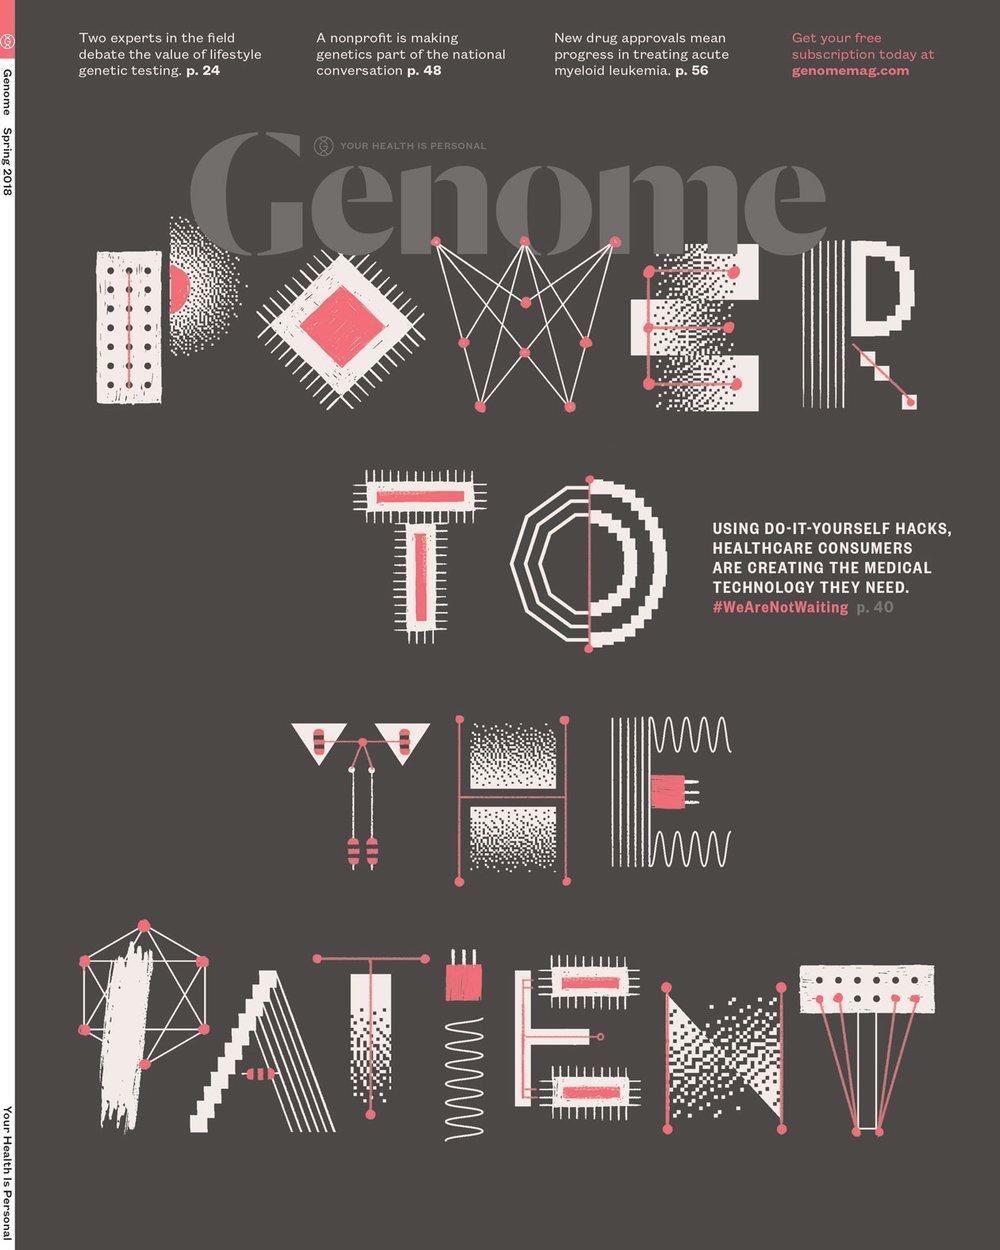 Photo courtesy of genomemag.com/category/issue/spring-2018/